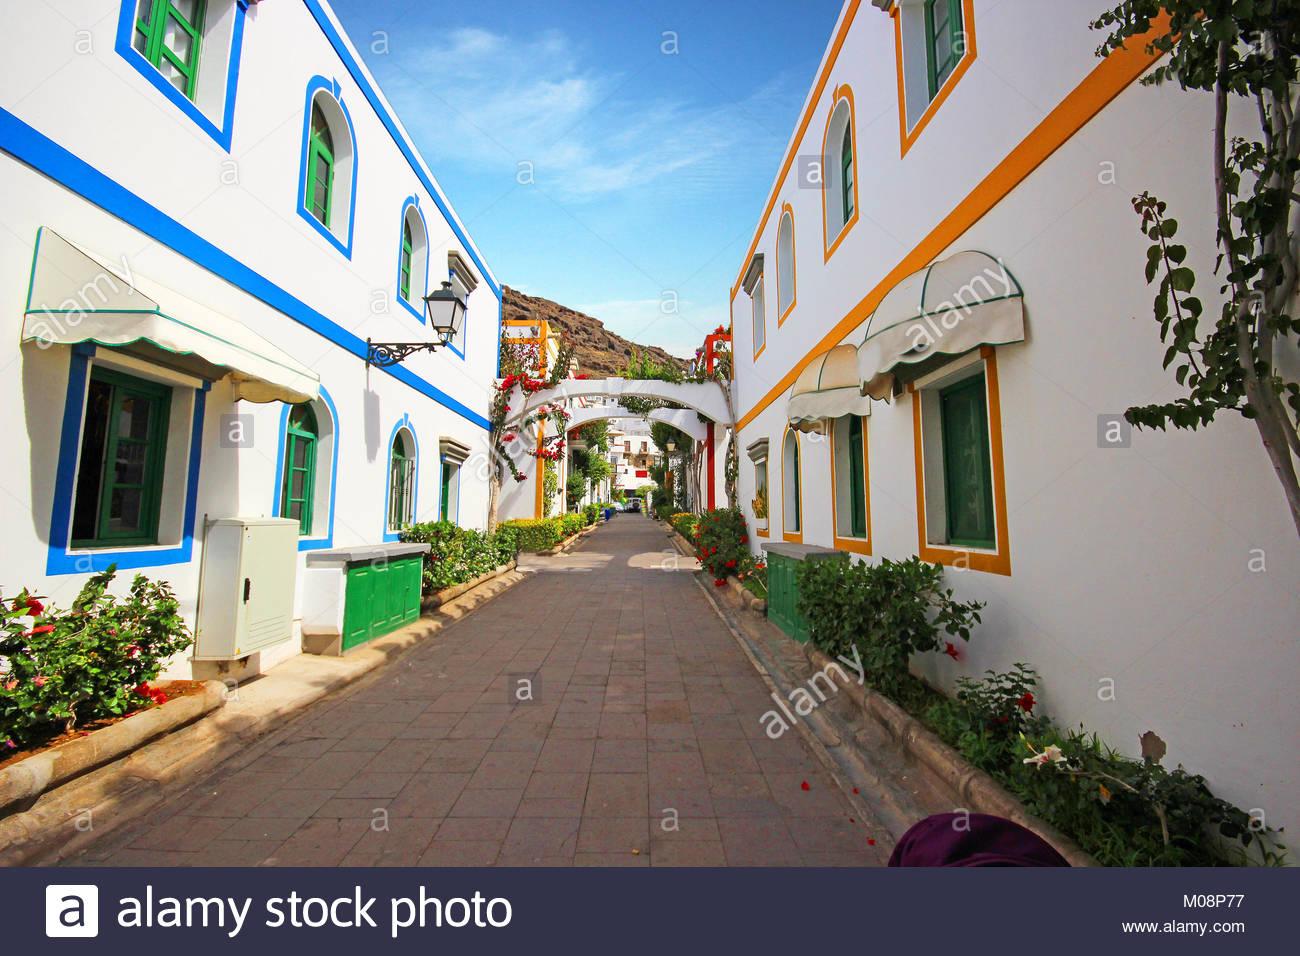 Puerto de Mogan. Wunderschöne Stadt auf Gran Canaria. Spanien Stockbild